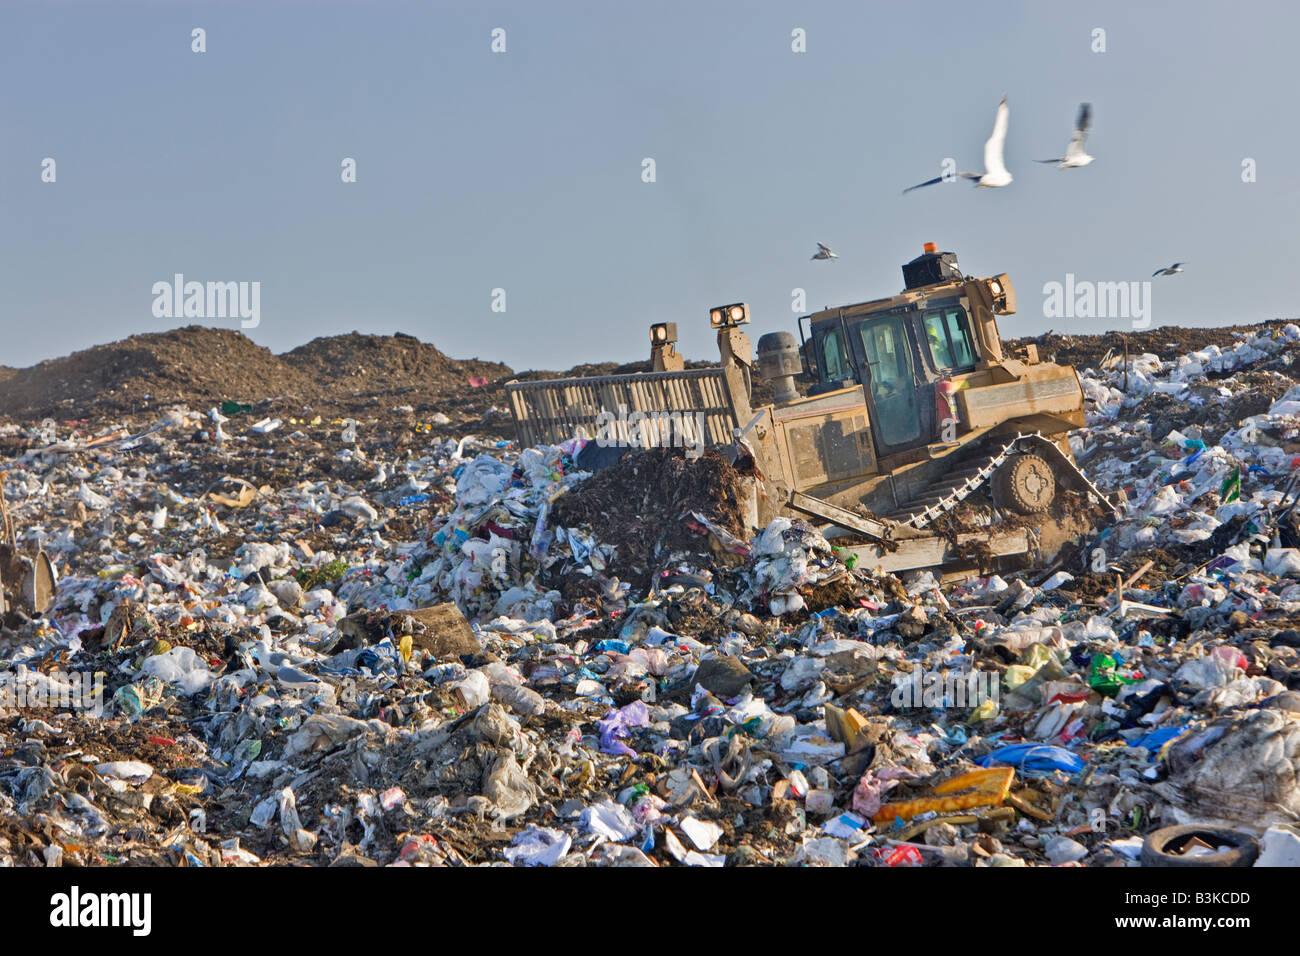 Tractor compactor/dozer pushing trash at landfill. - Stock Image